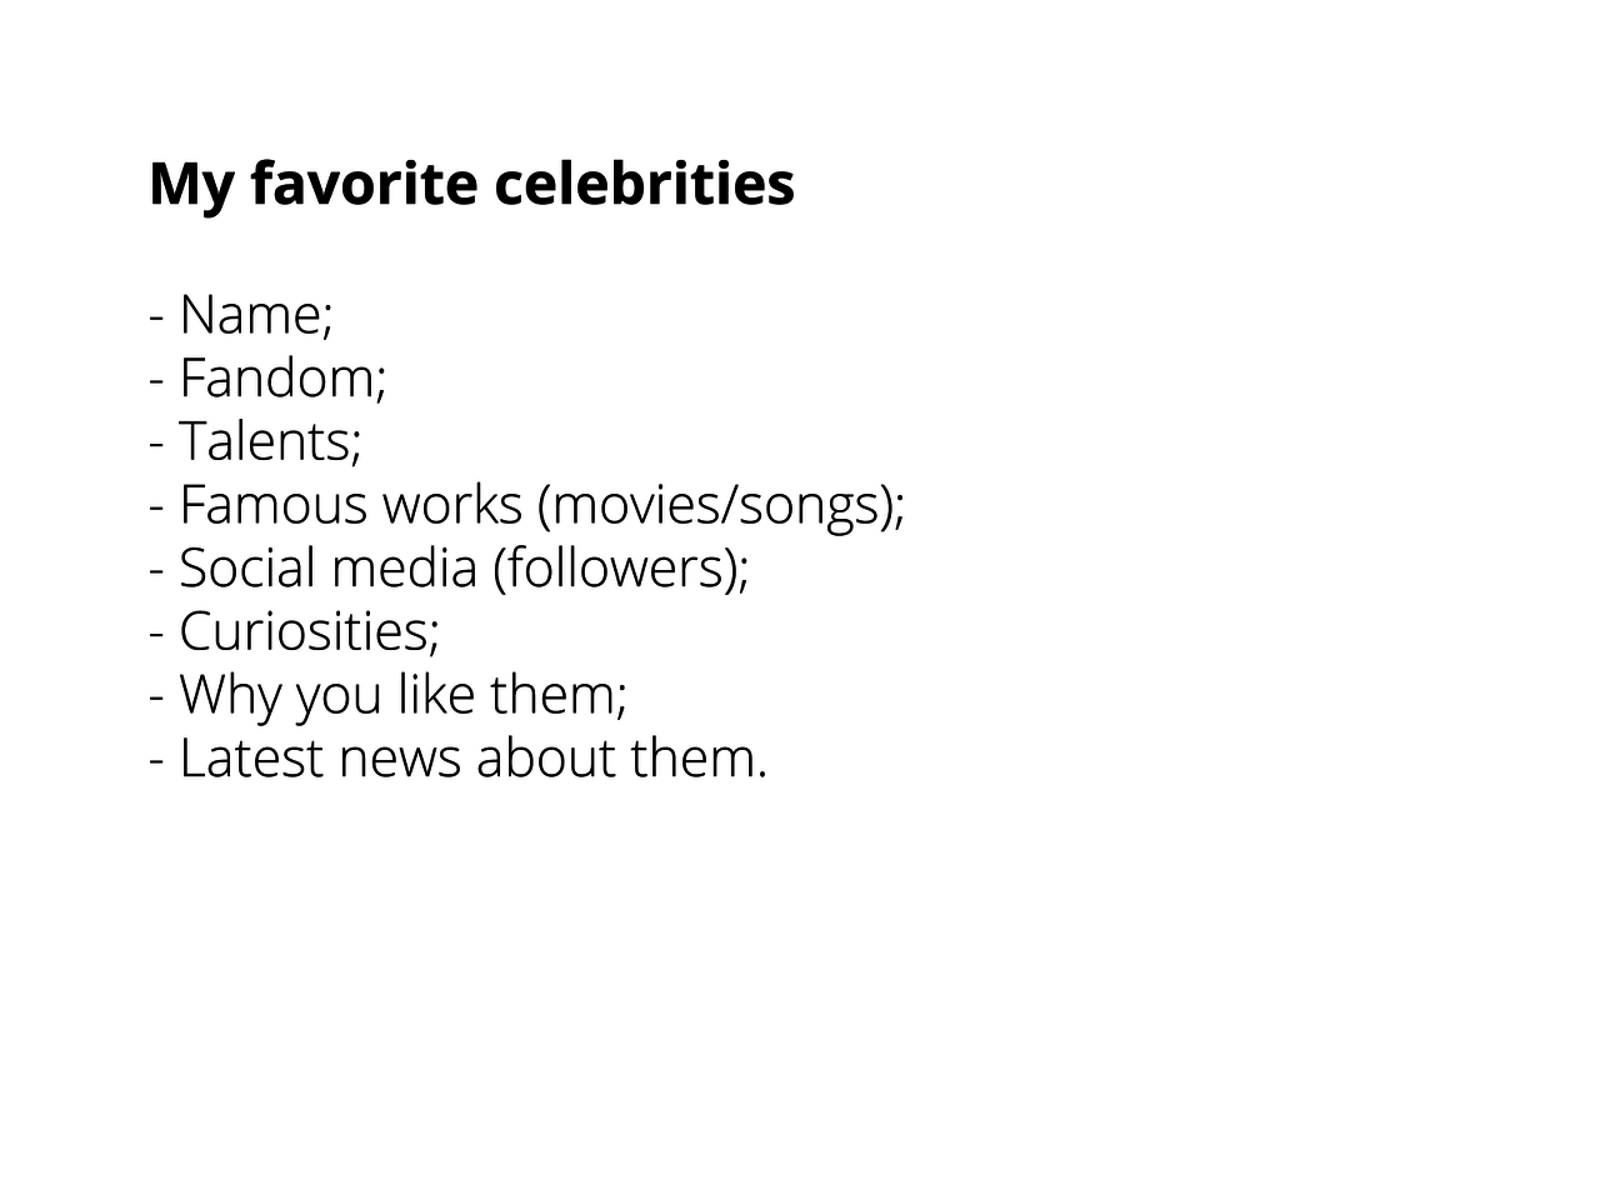 O futuro das celebridades